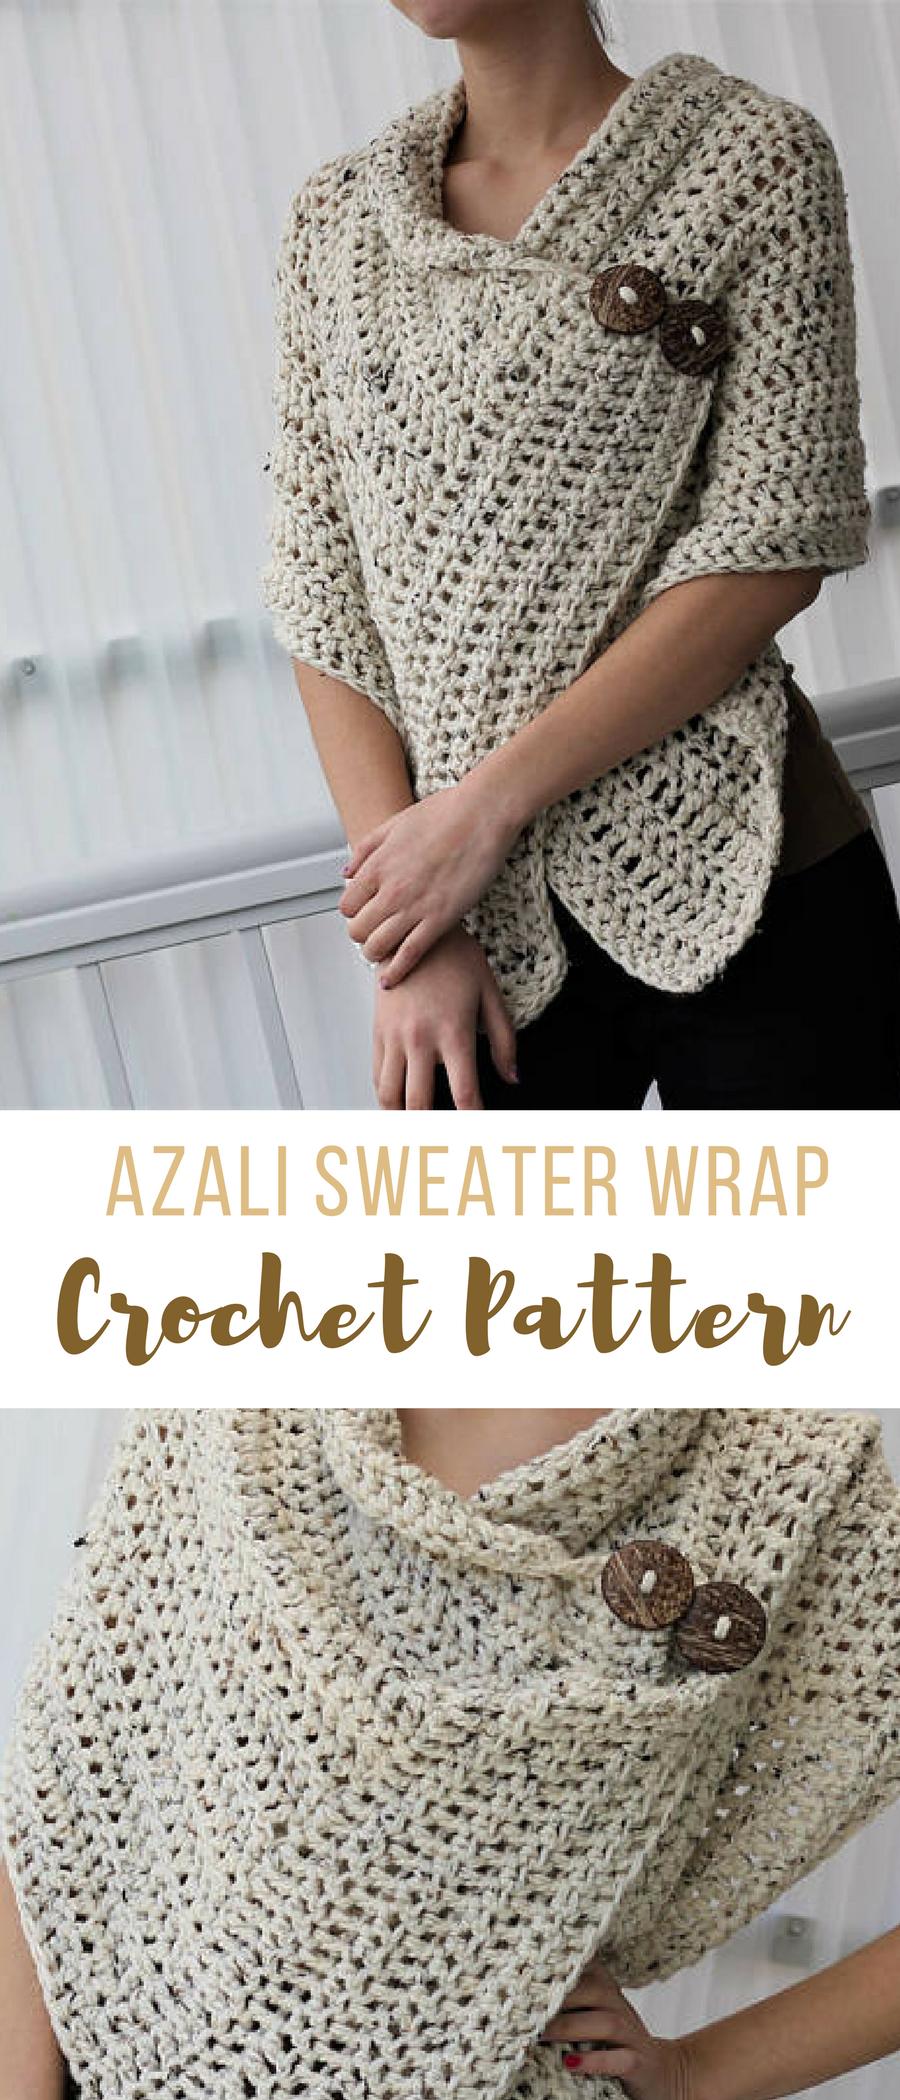 Easy Crochet Pattern Beginner Crochet Patron Crochet Azali